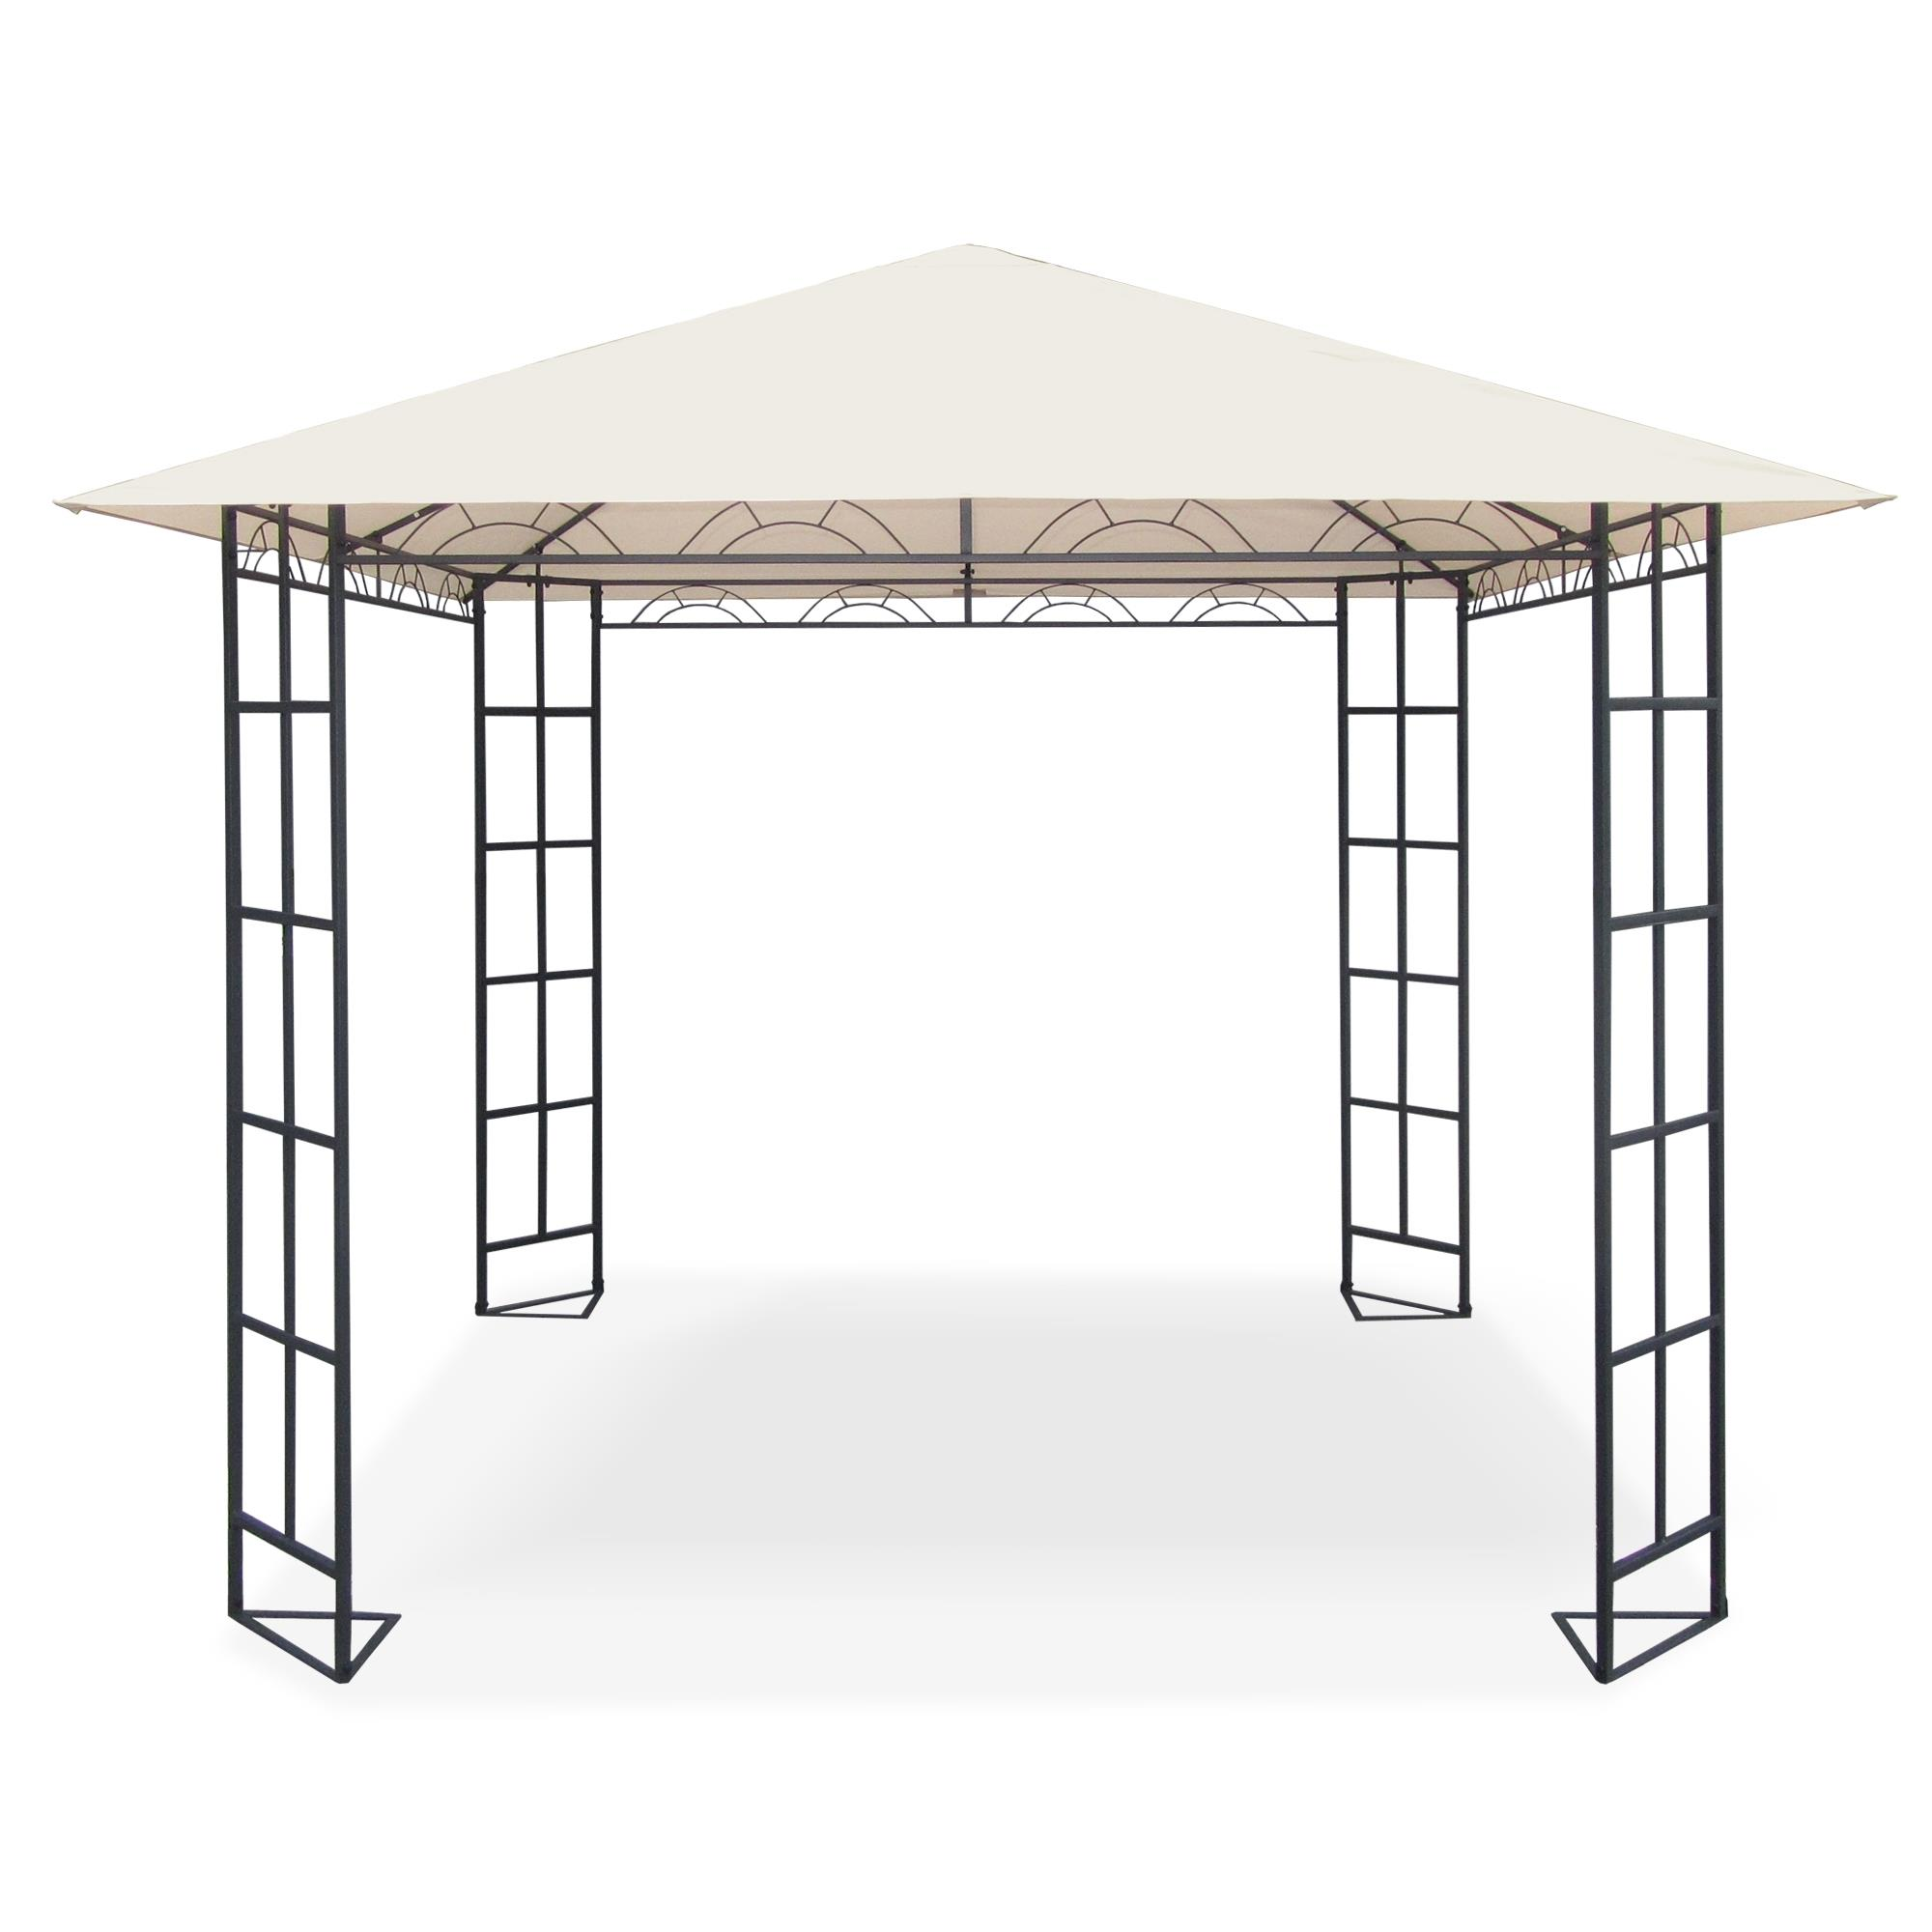 pavillon 2 5x2 5 hp 19v 7 1a pavilion zd7300 end 3 23 2018 3 15 pm hp nx9500 end 7 4 2017 2 15. Black Bedroom Furniture Sets. Home Design Ideas